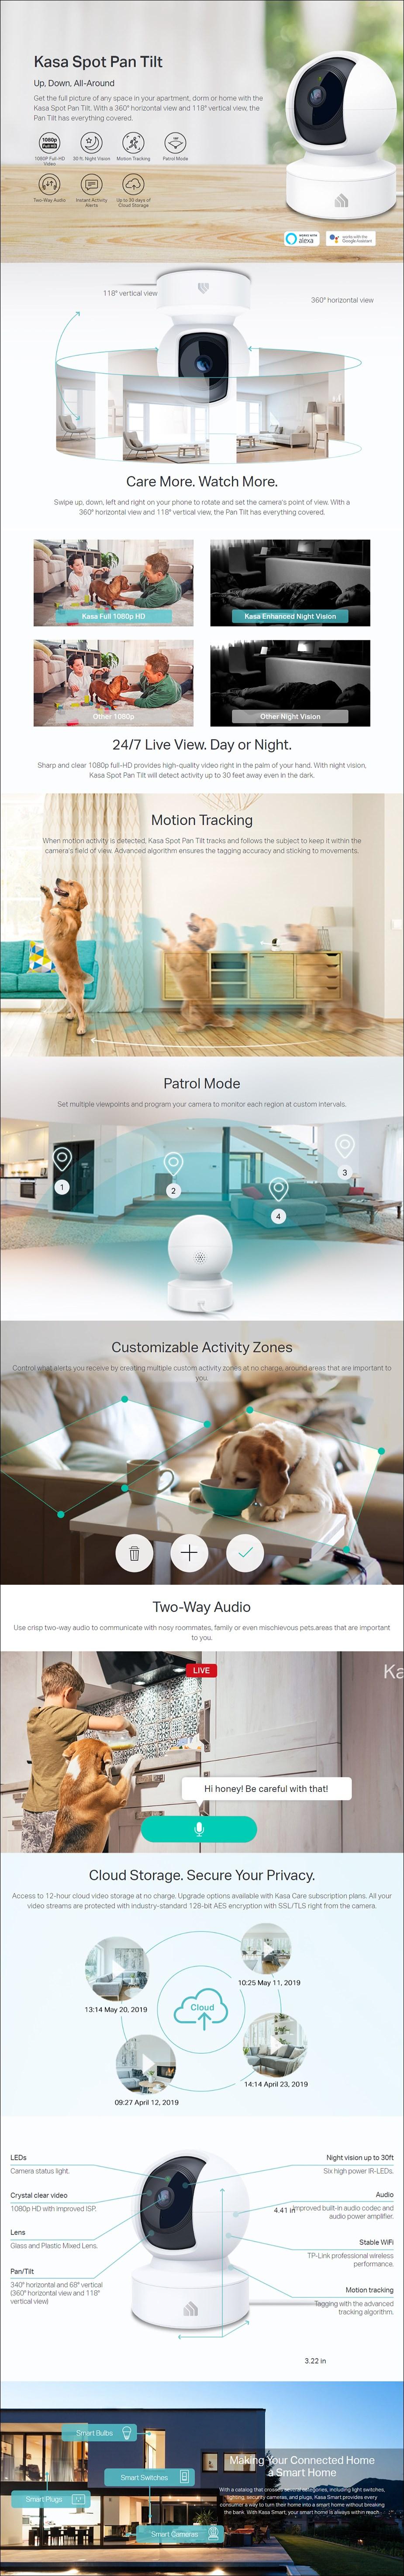 TP-Link KC110 Kasa Spot Pan Tilt 1080p Indoor Security Camera - Overview 1